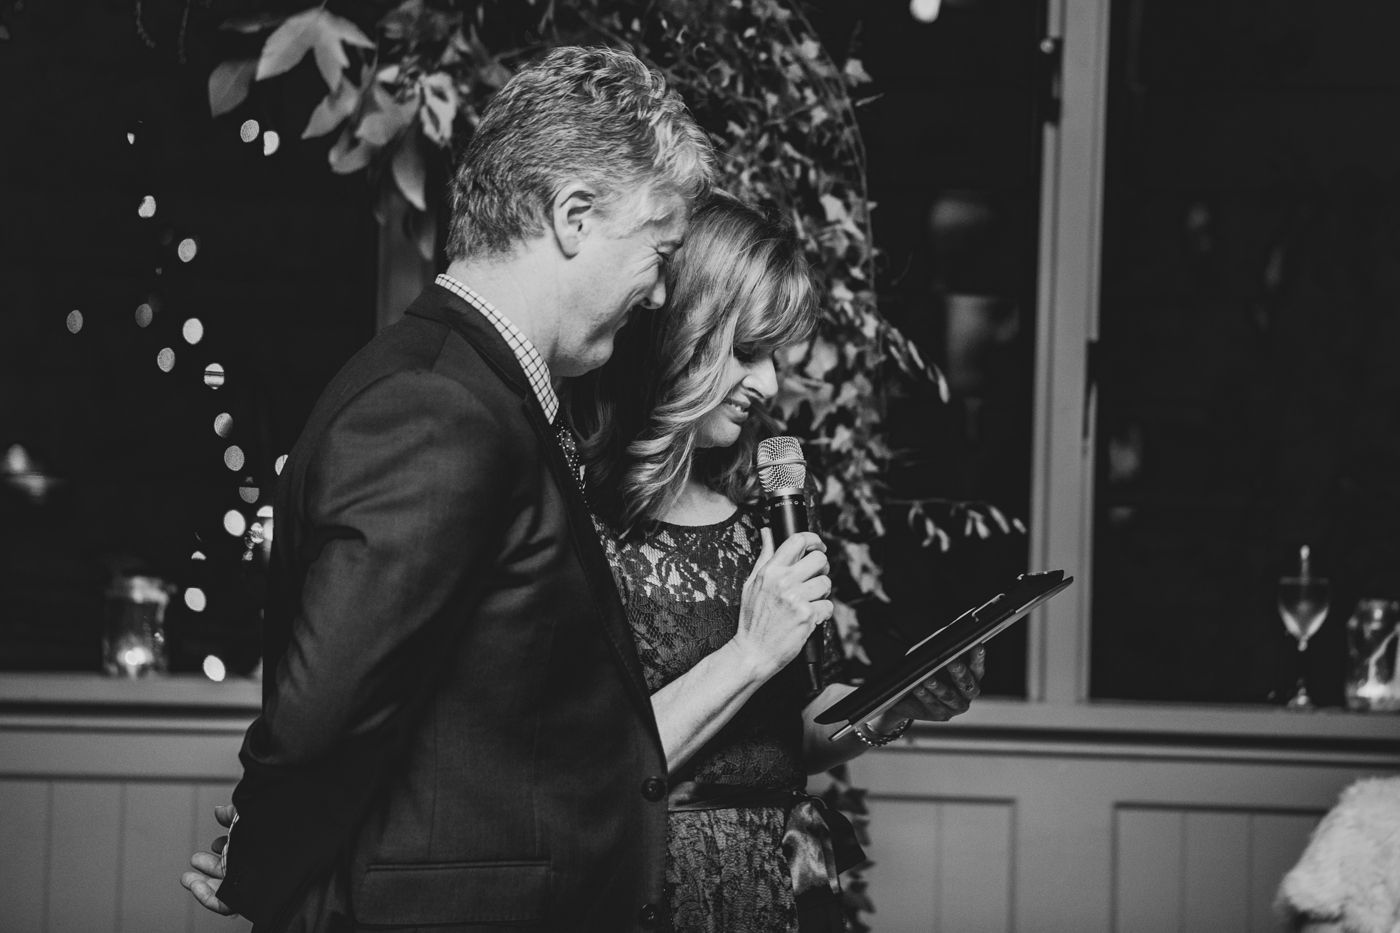 Jo & Tom Wedding - The Grounds of Alexandria - Samantha Heather Photography-312.jpg